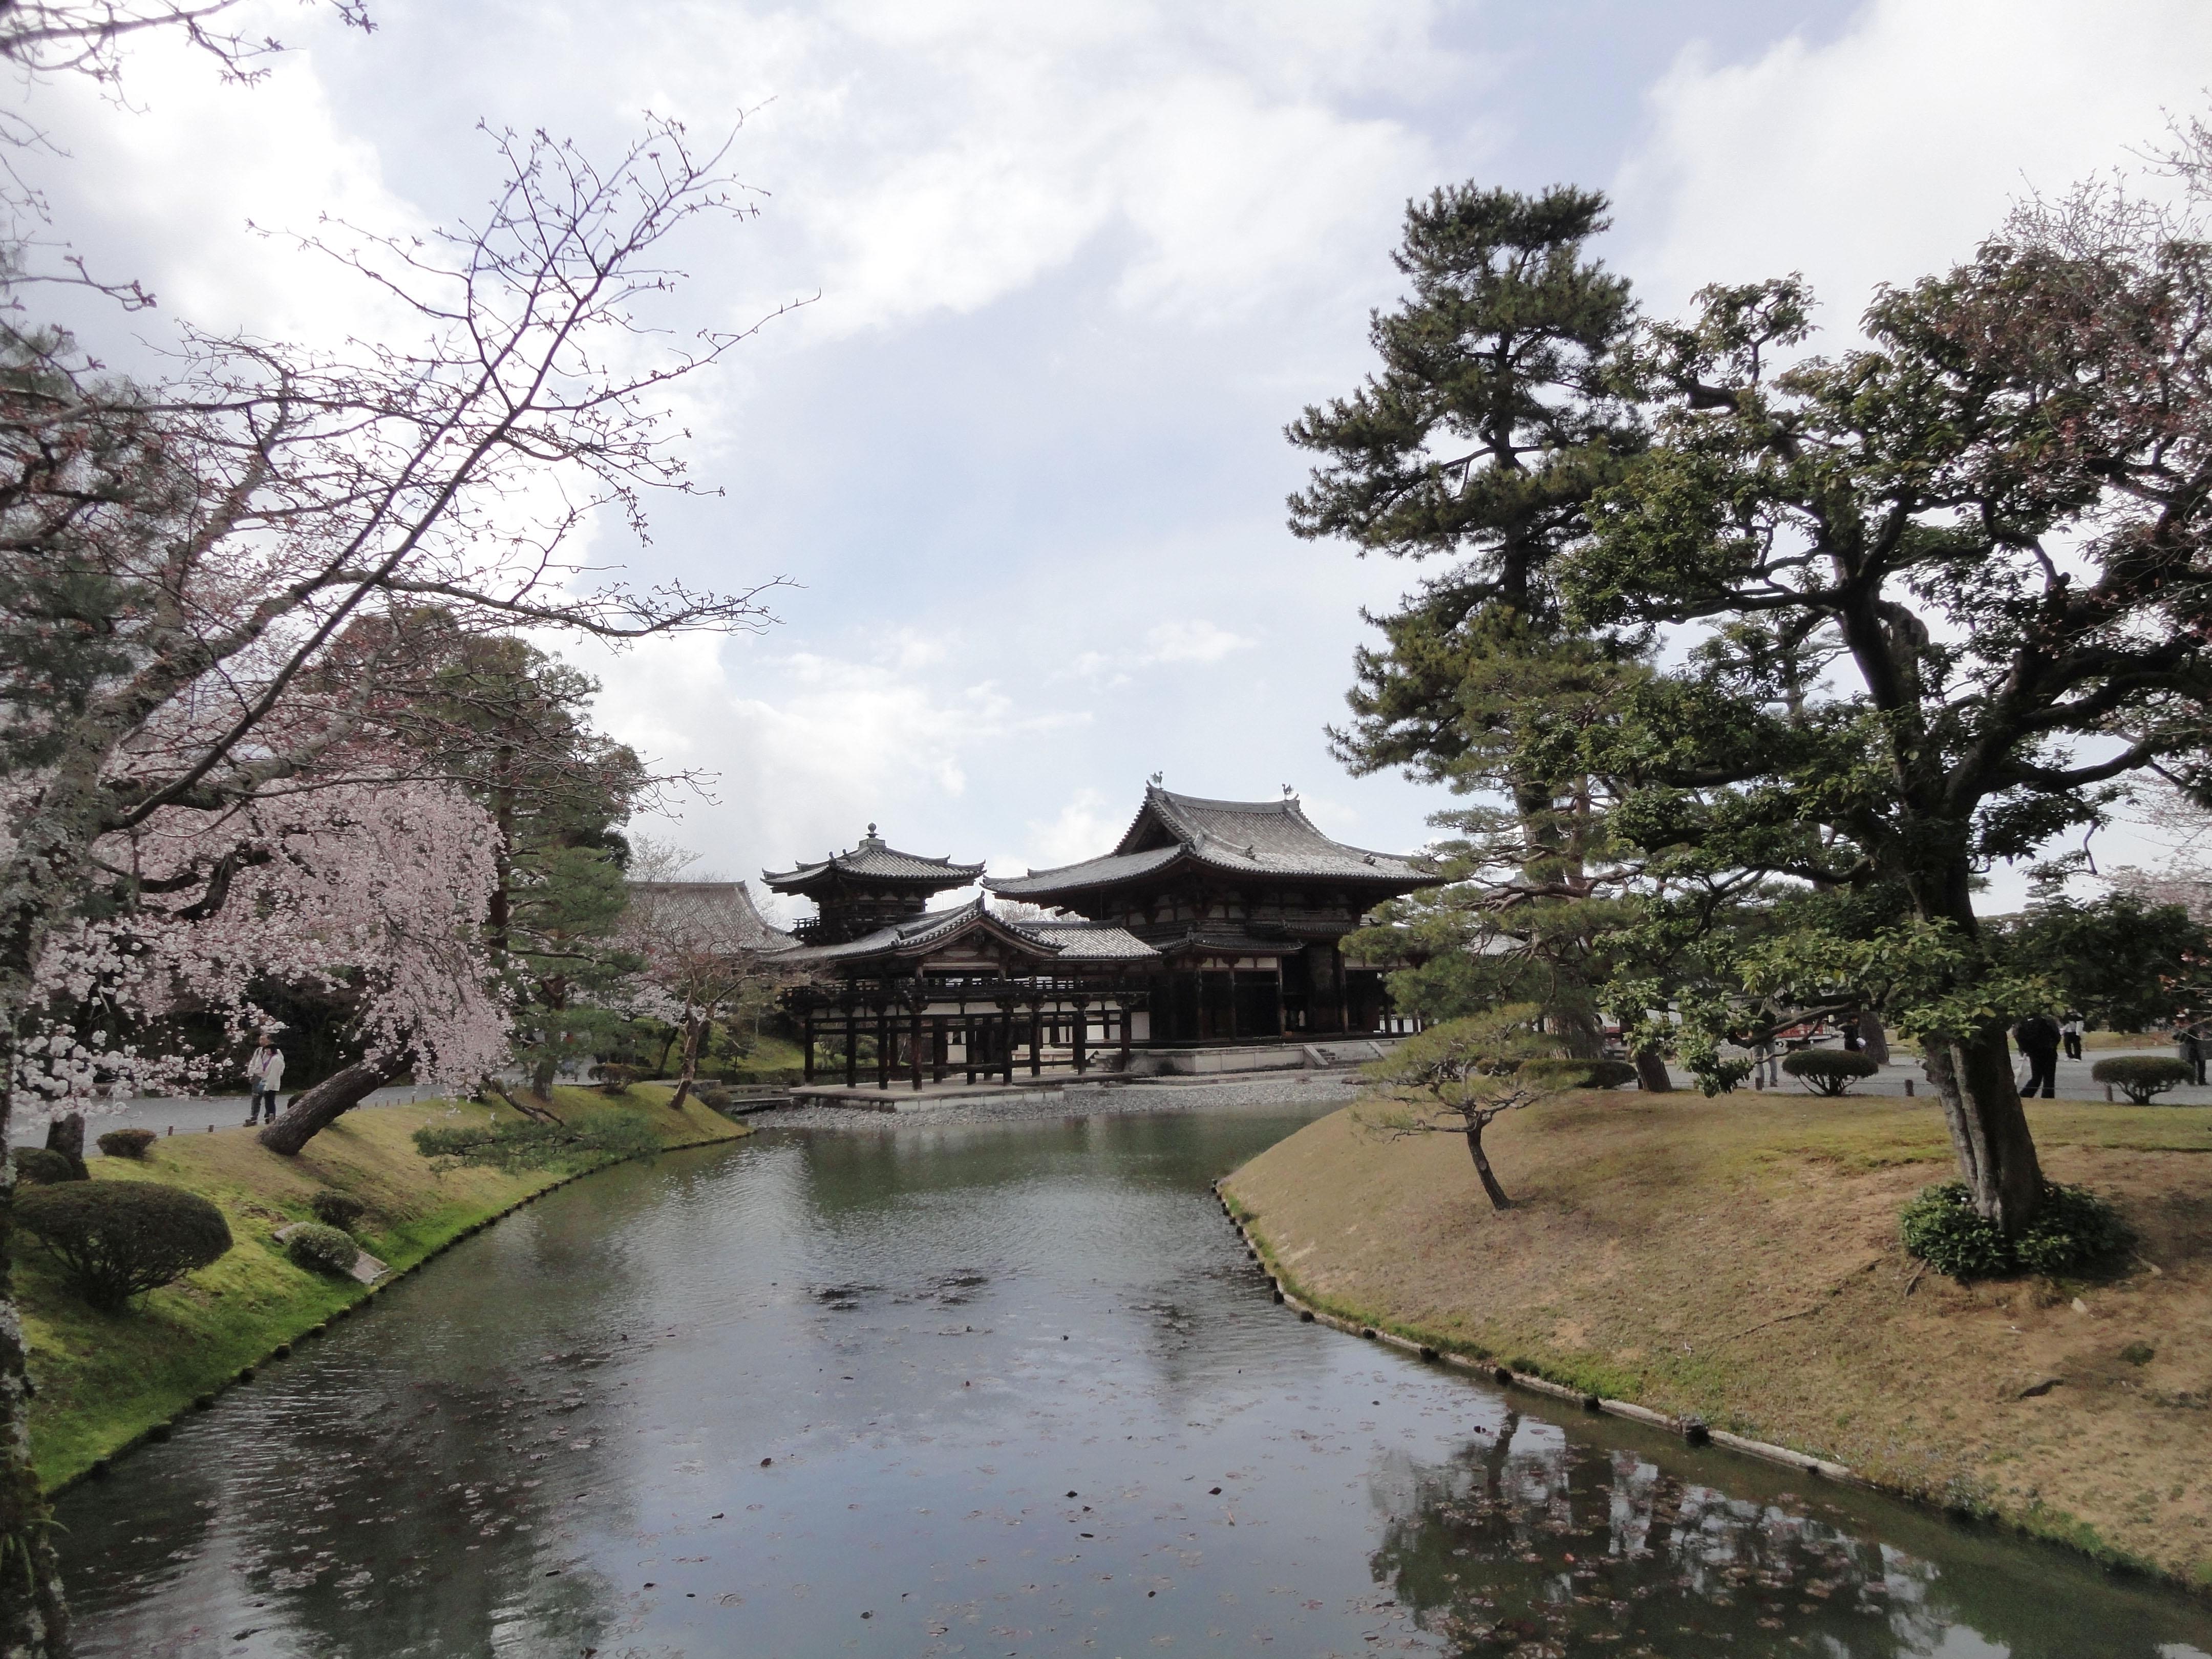 Byodo in temple Jodo shiki garden walkway facing Phoenix Hall Kyoto Japan 05